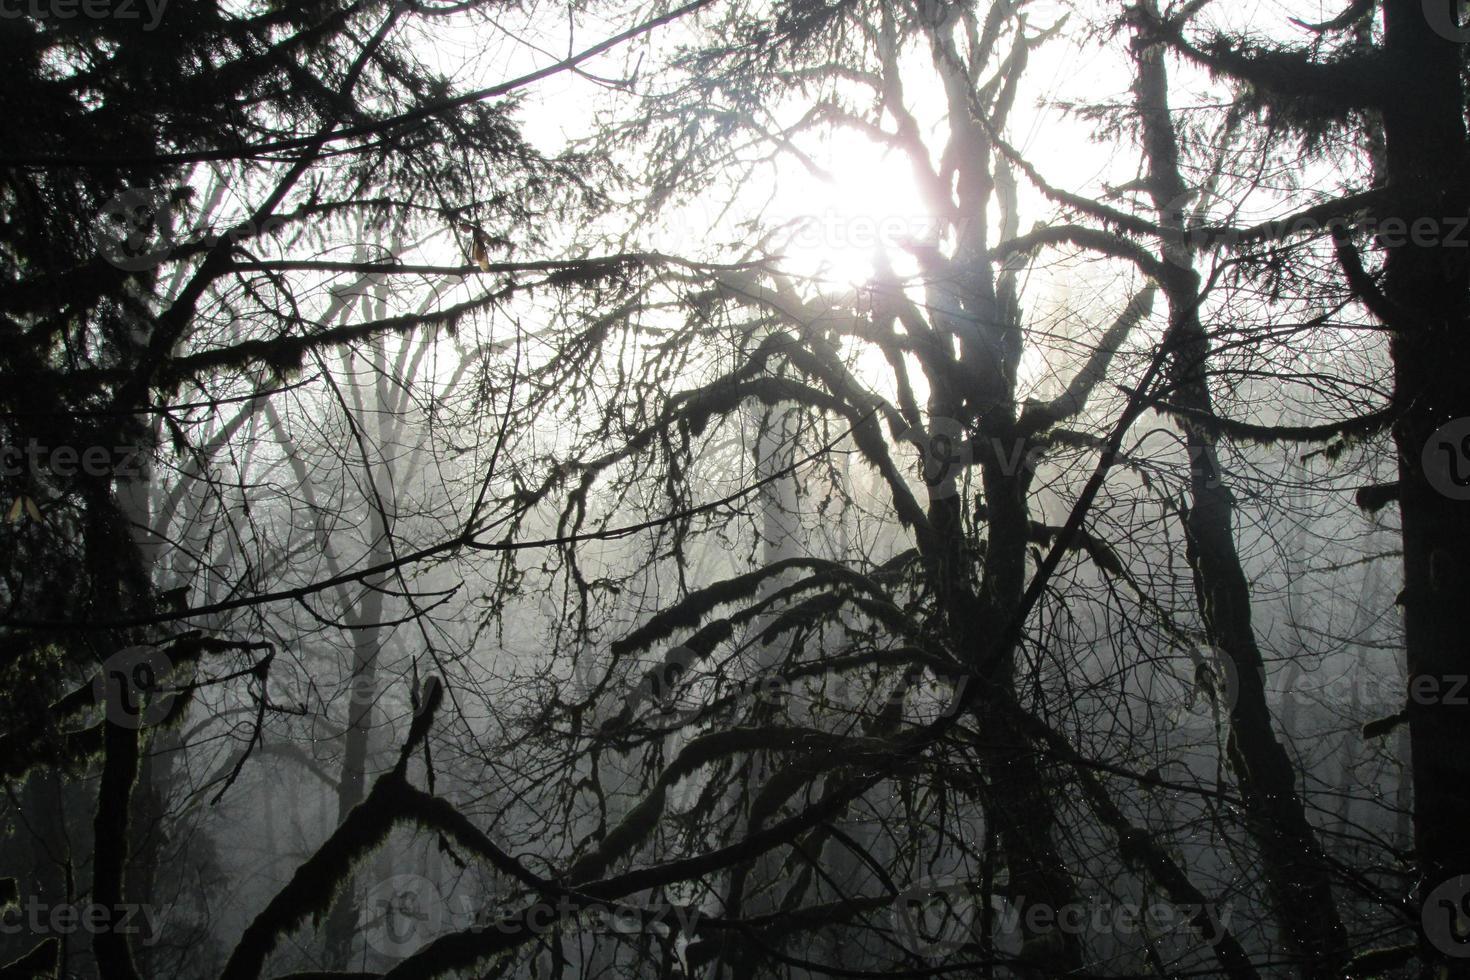 oregon dimmig morgon med träd foto